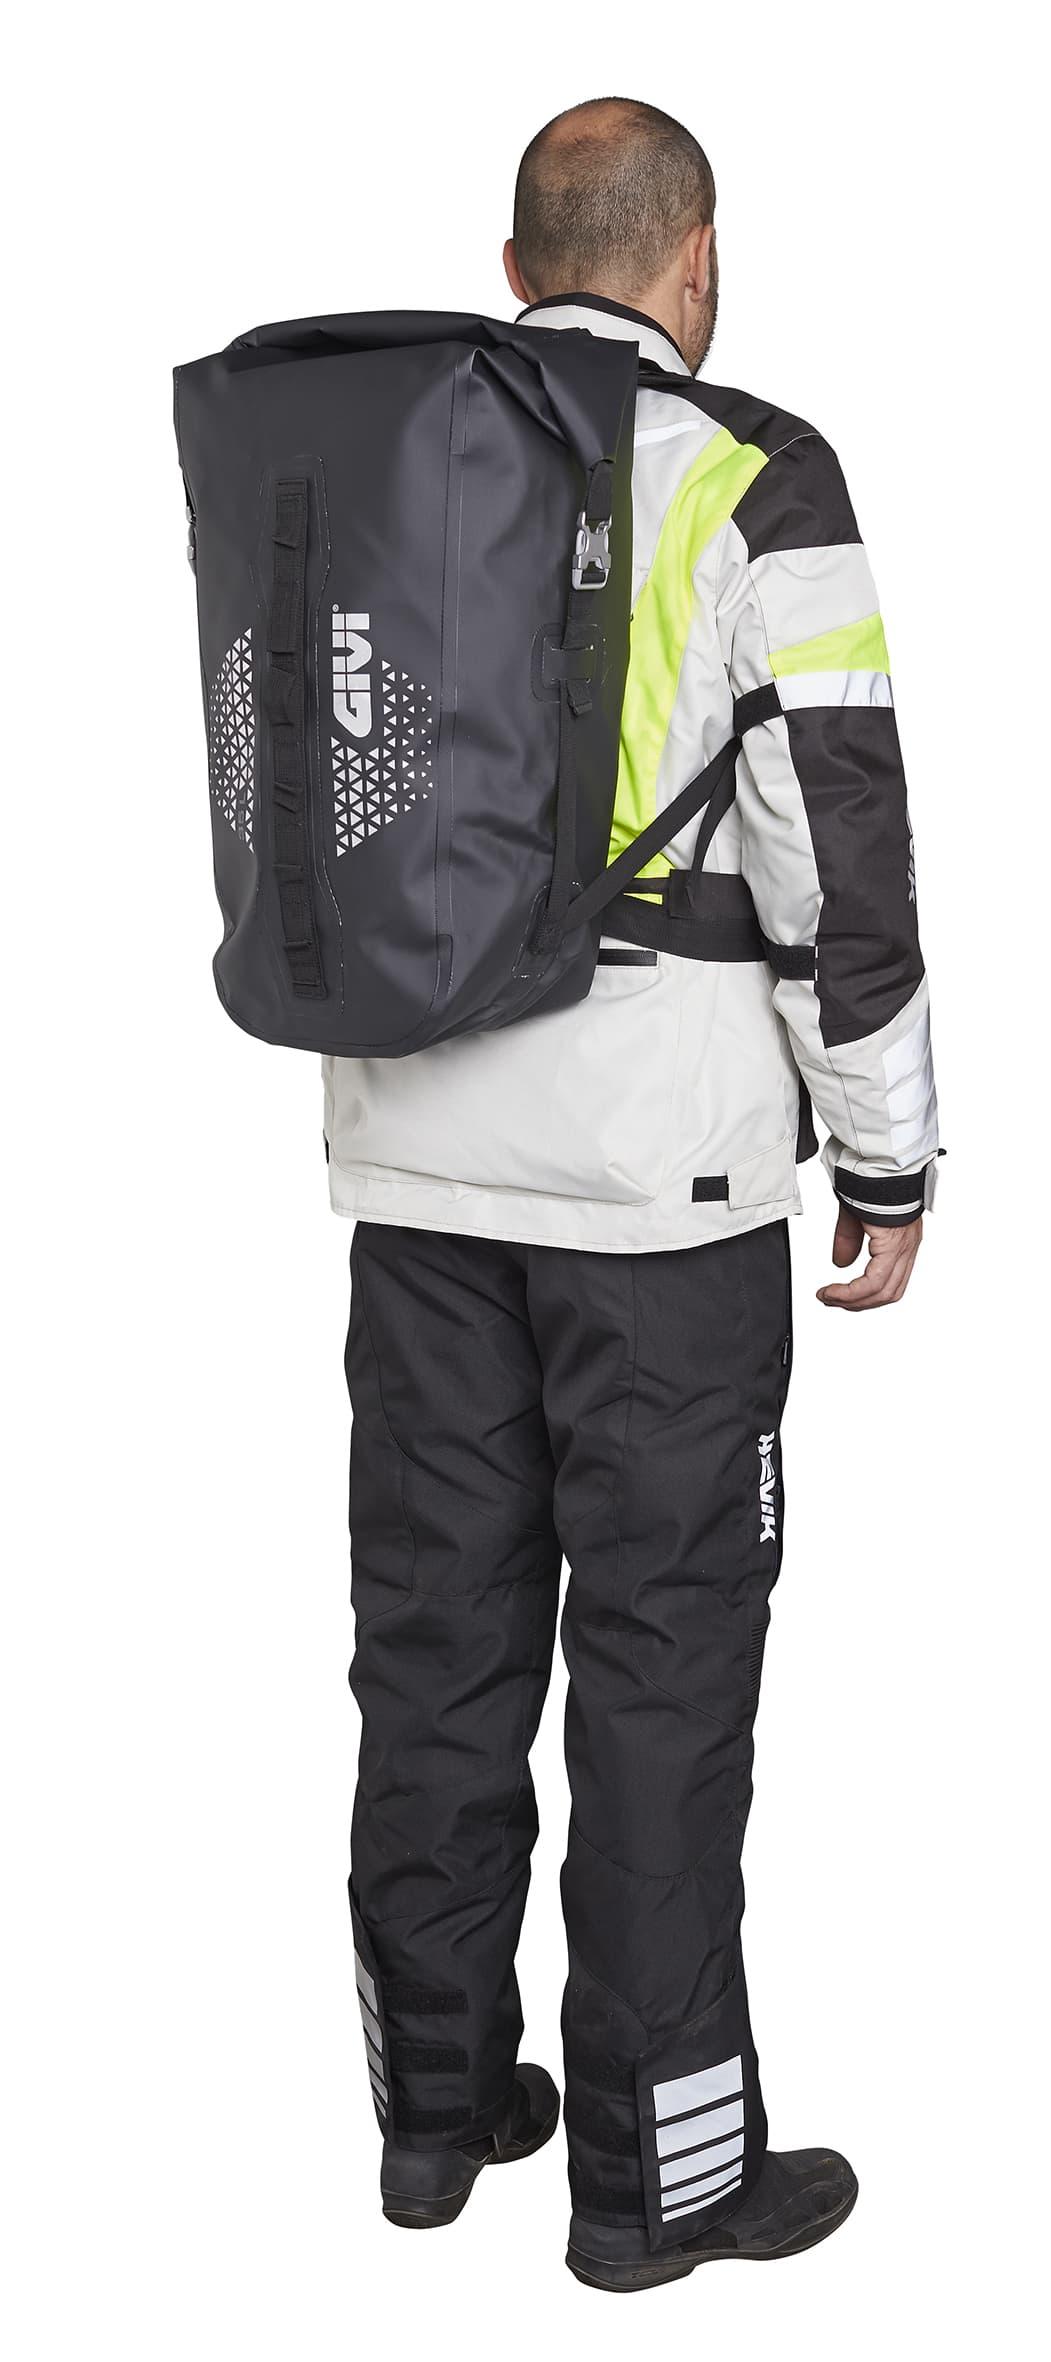 cf7a7e59e6 Waterproof Backpack (35 Liter) – 2×2 Cycles